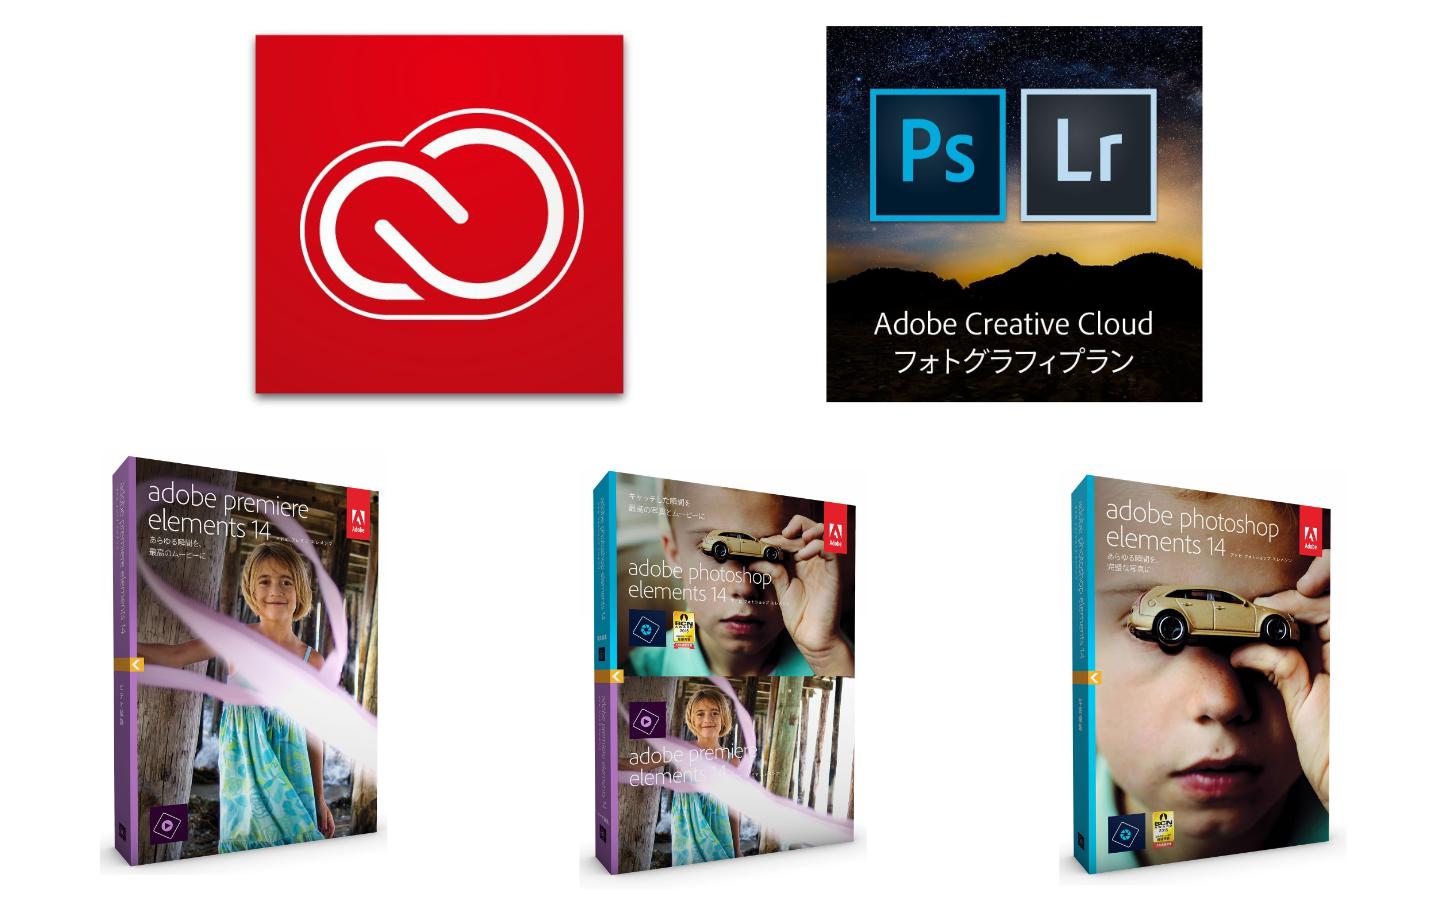 Adobe Final Sale